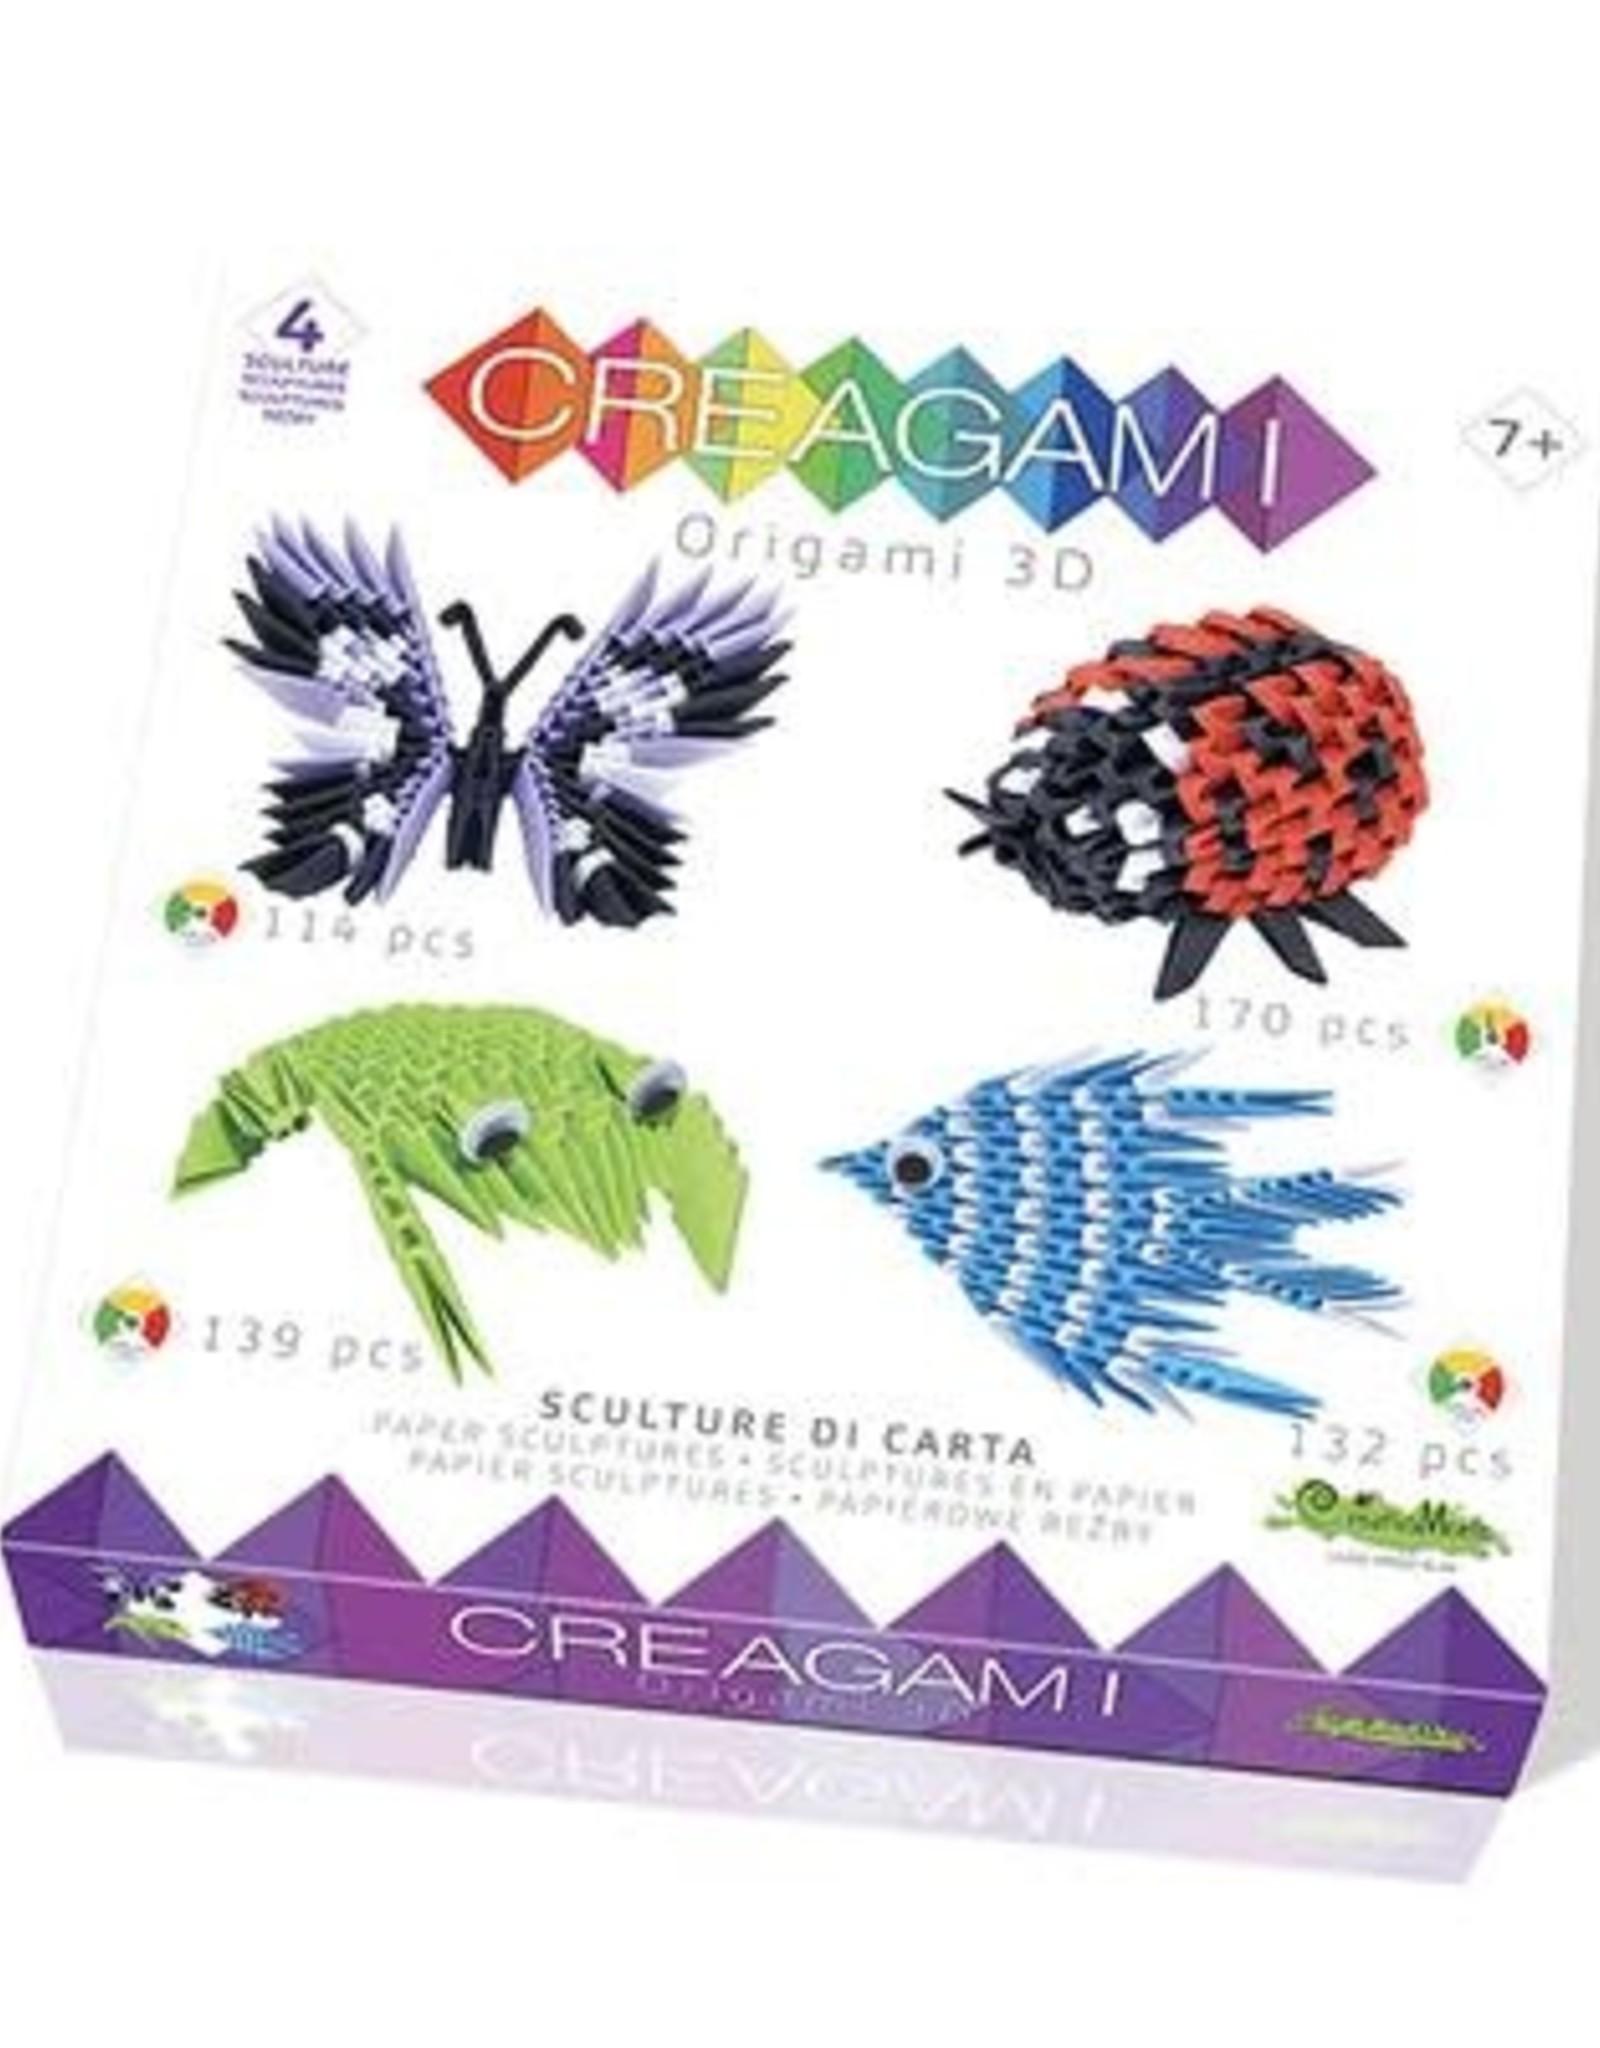 Creagami Creagami-Kit of 4 555pc